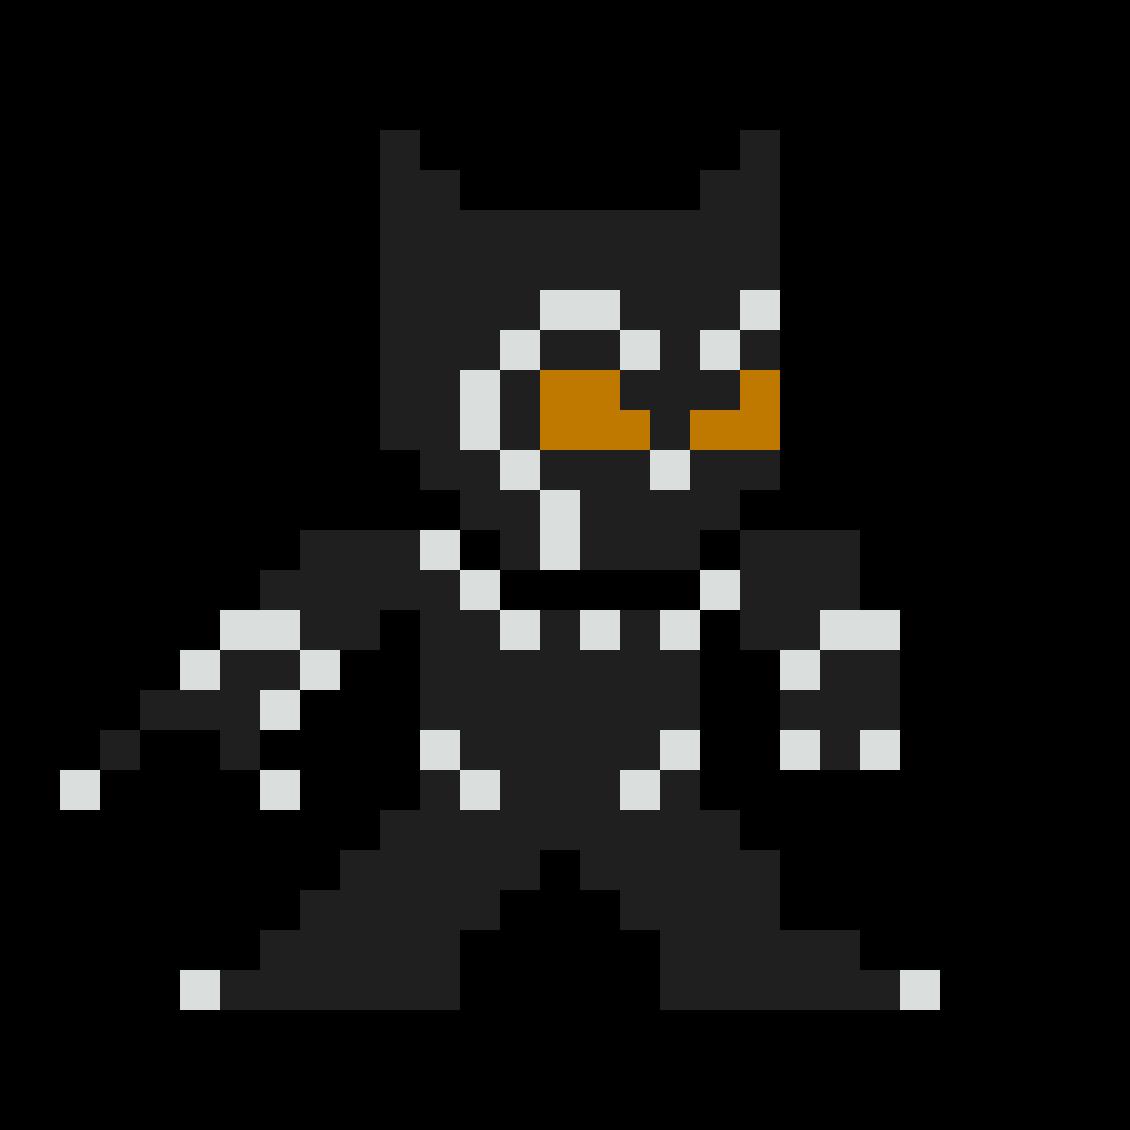 Black Panther (T'challa) by DragonShawdon